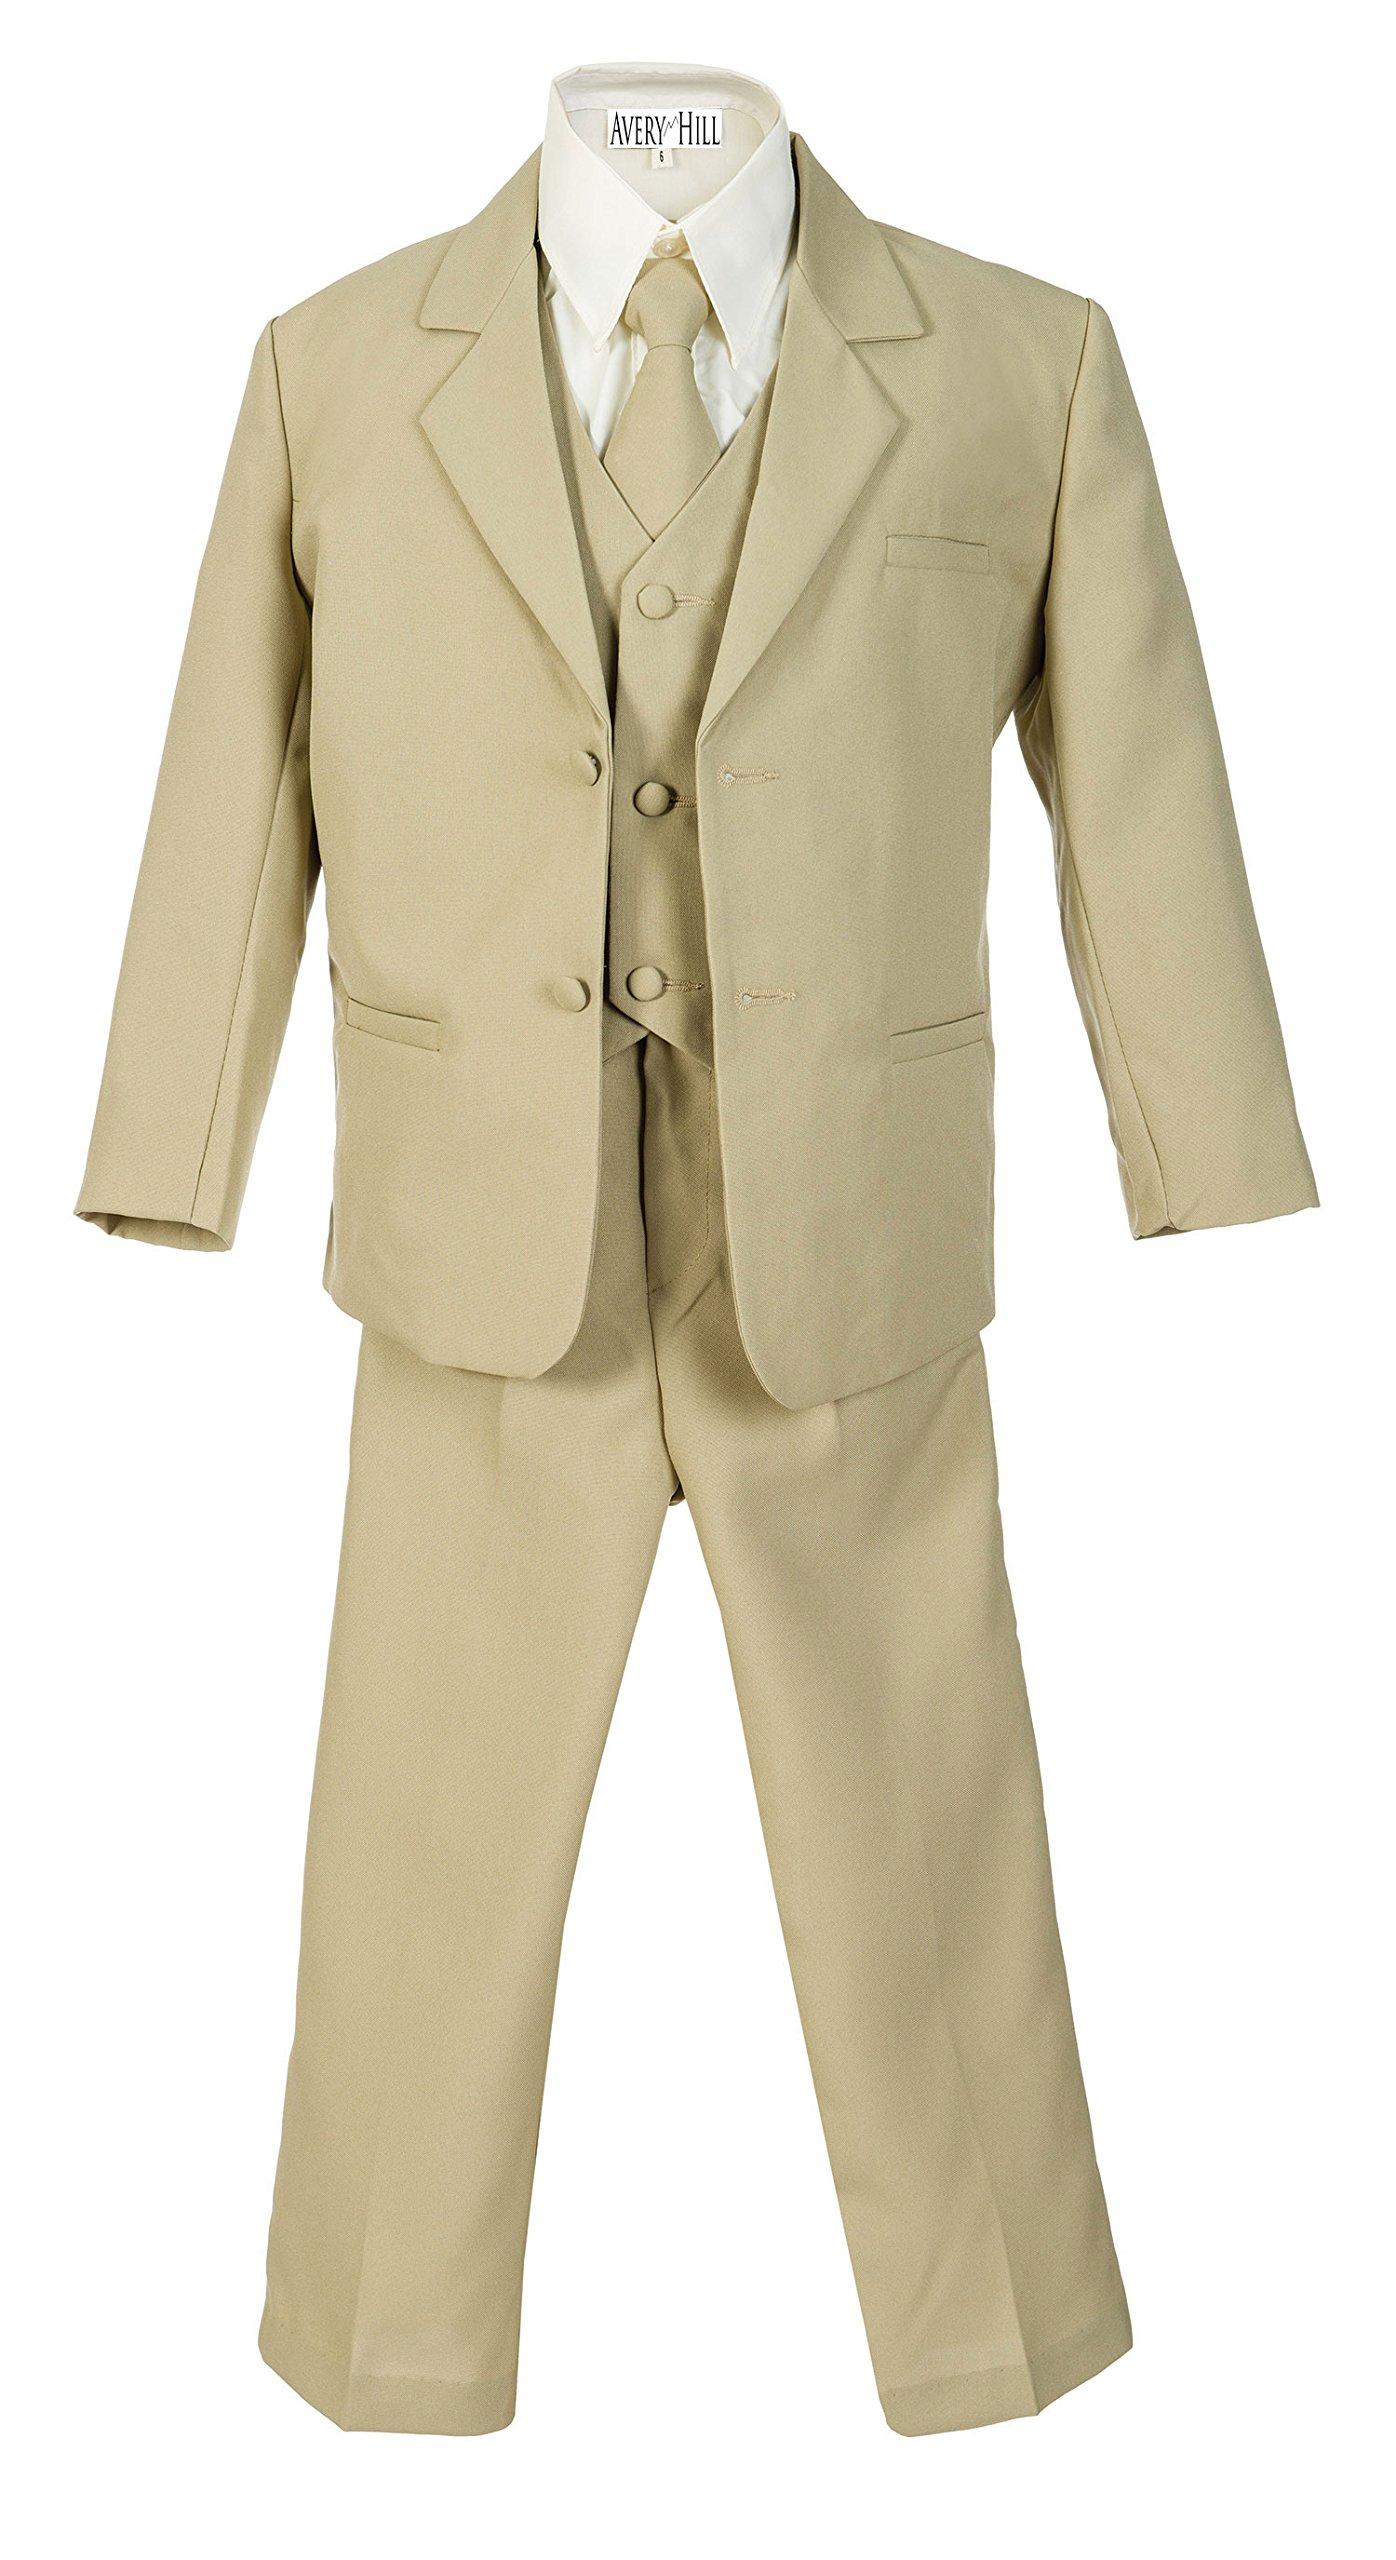 Avery Hill Boys Formal 5 Piece Suit Shirt Vest KH 16